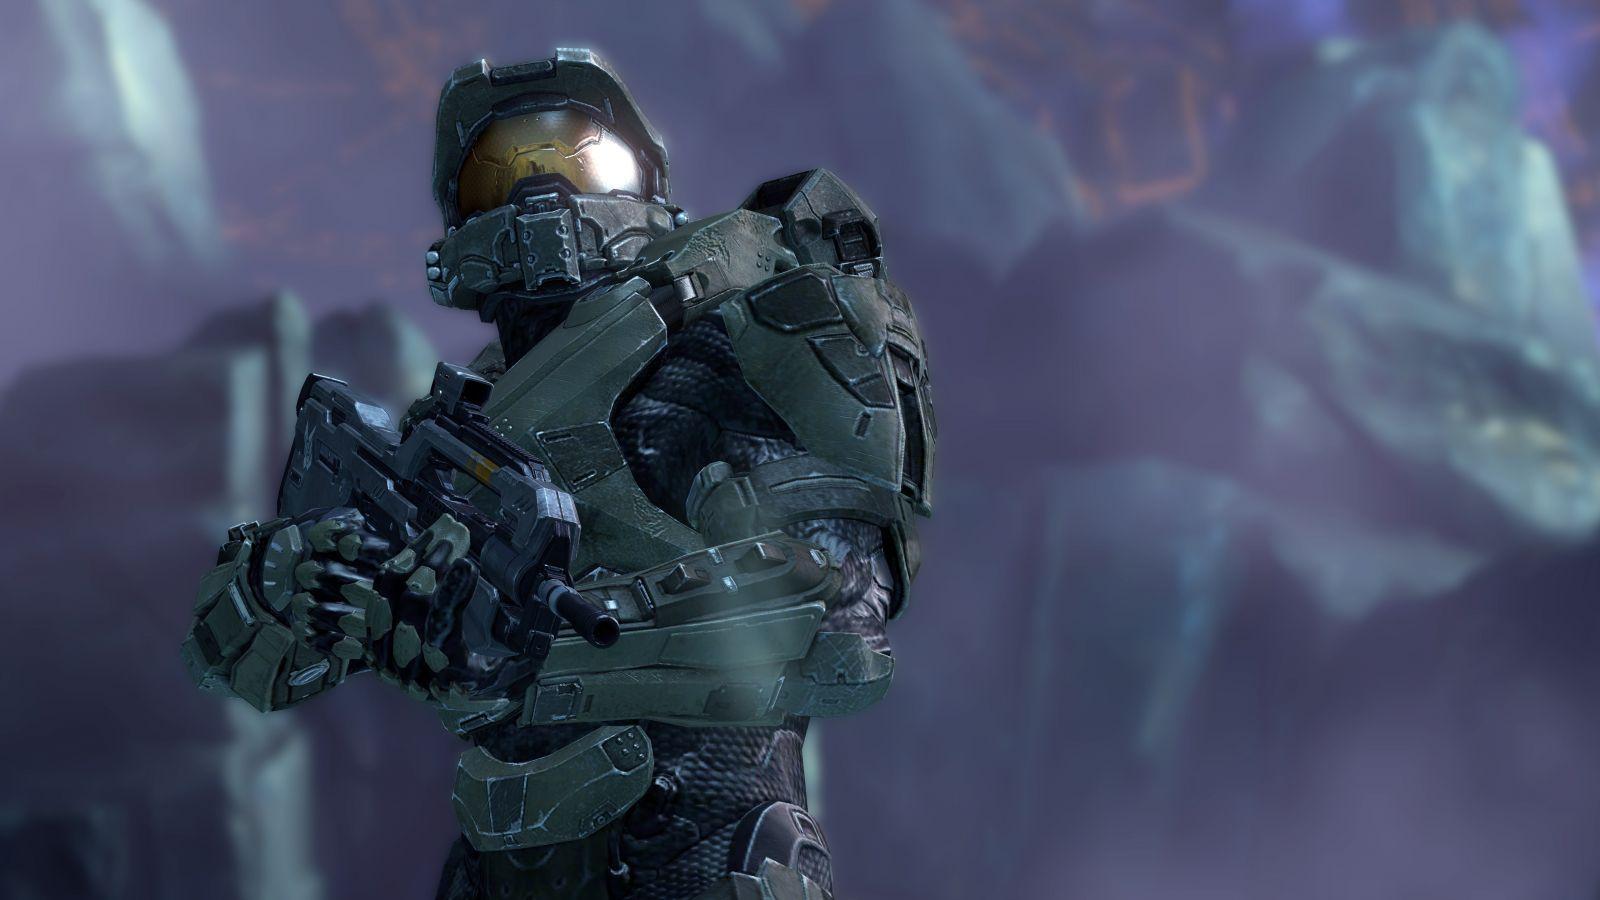 Арт к игре Halo 4